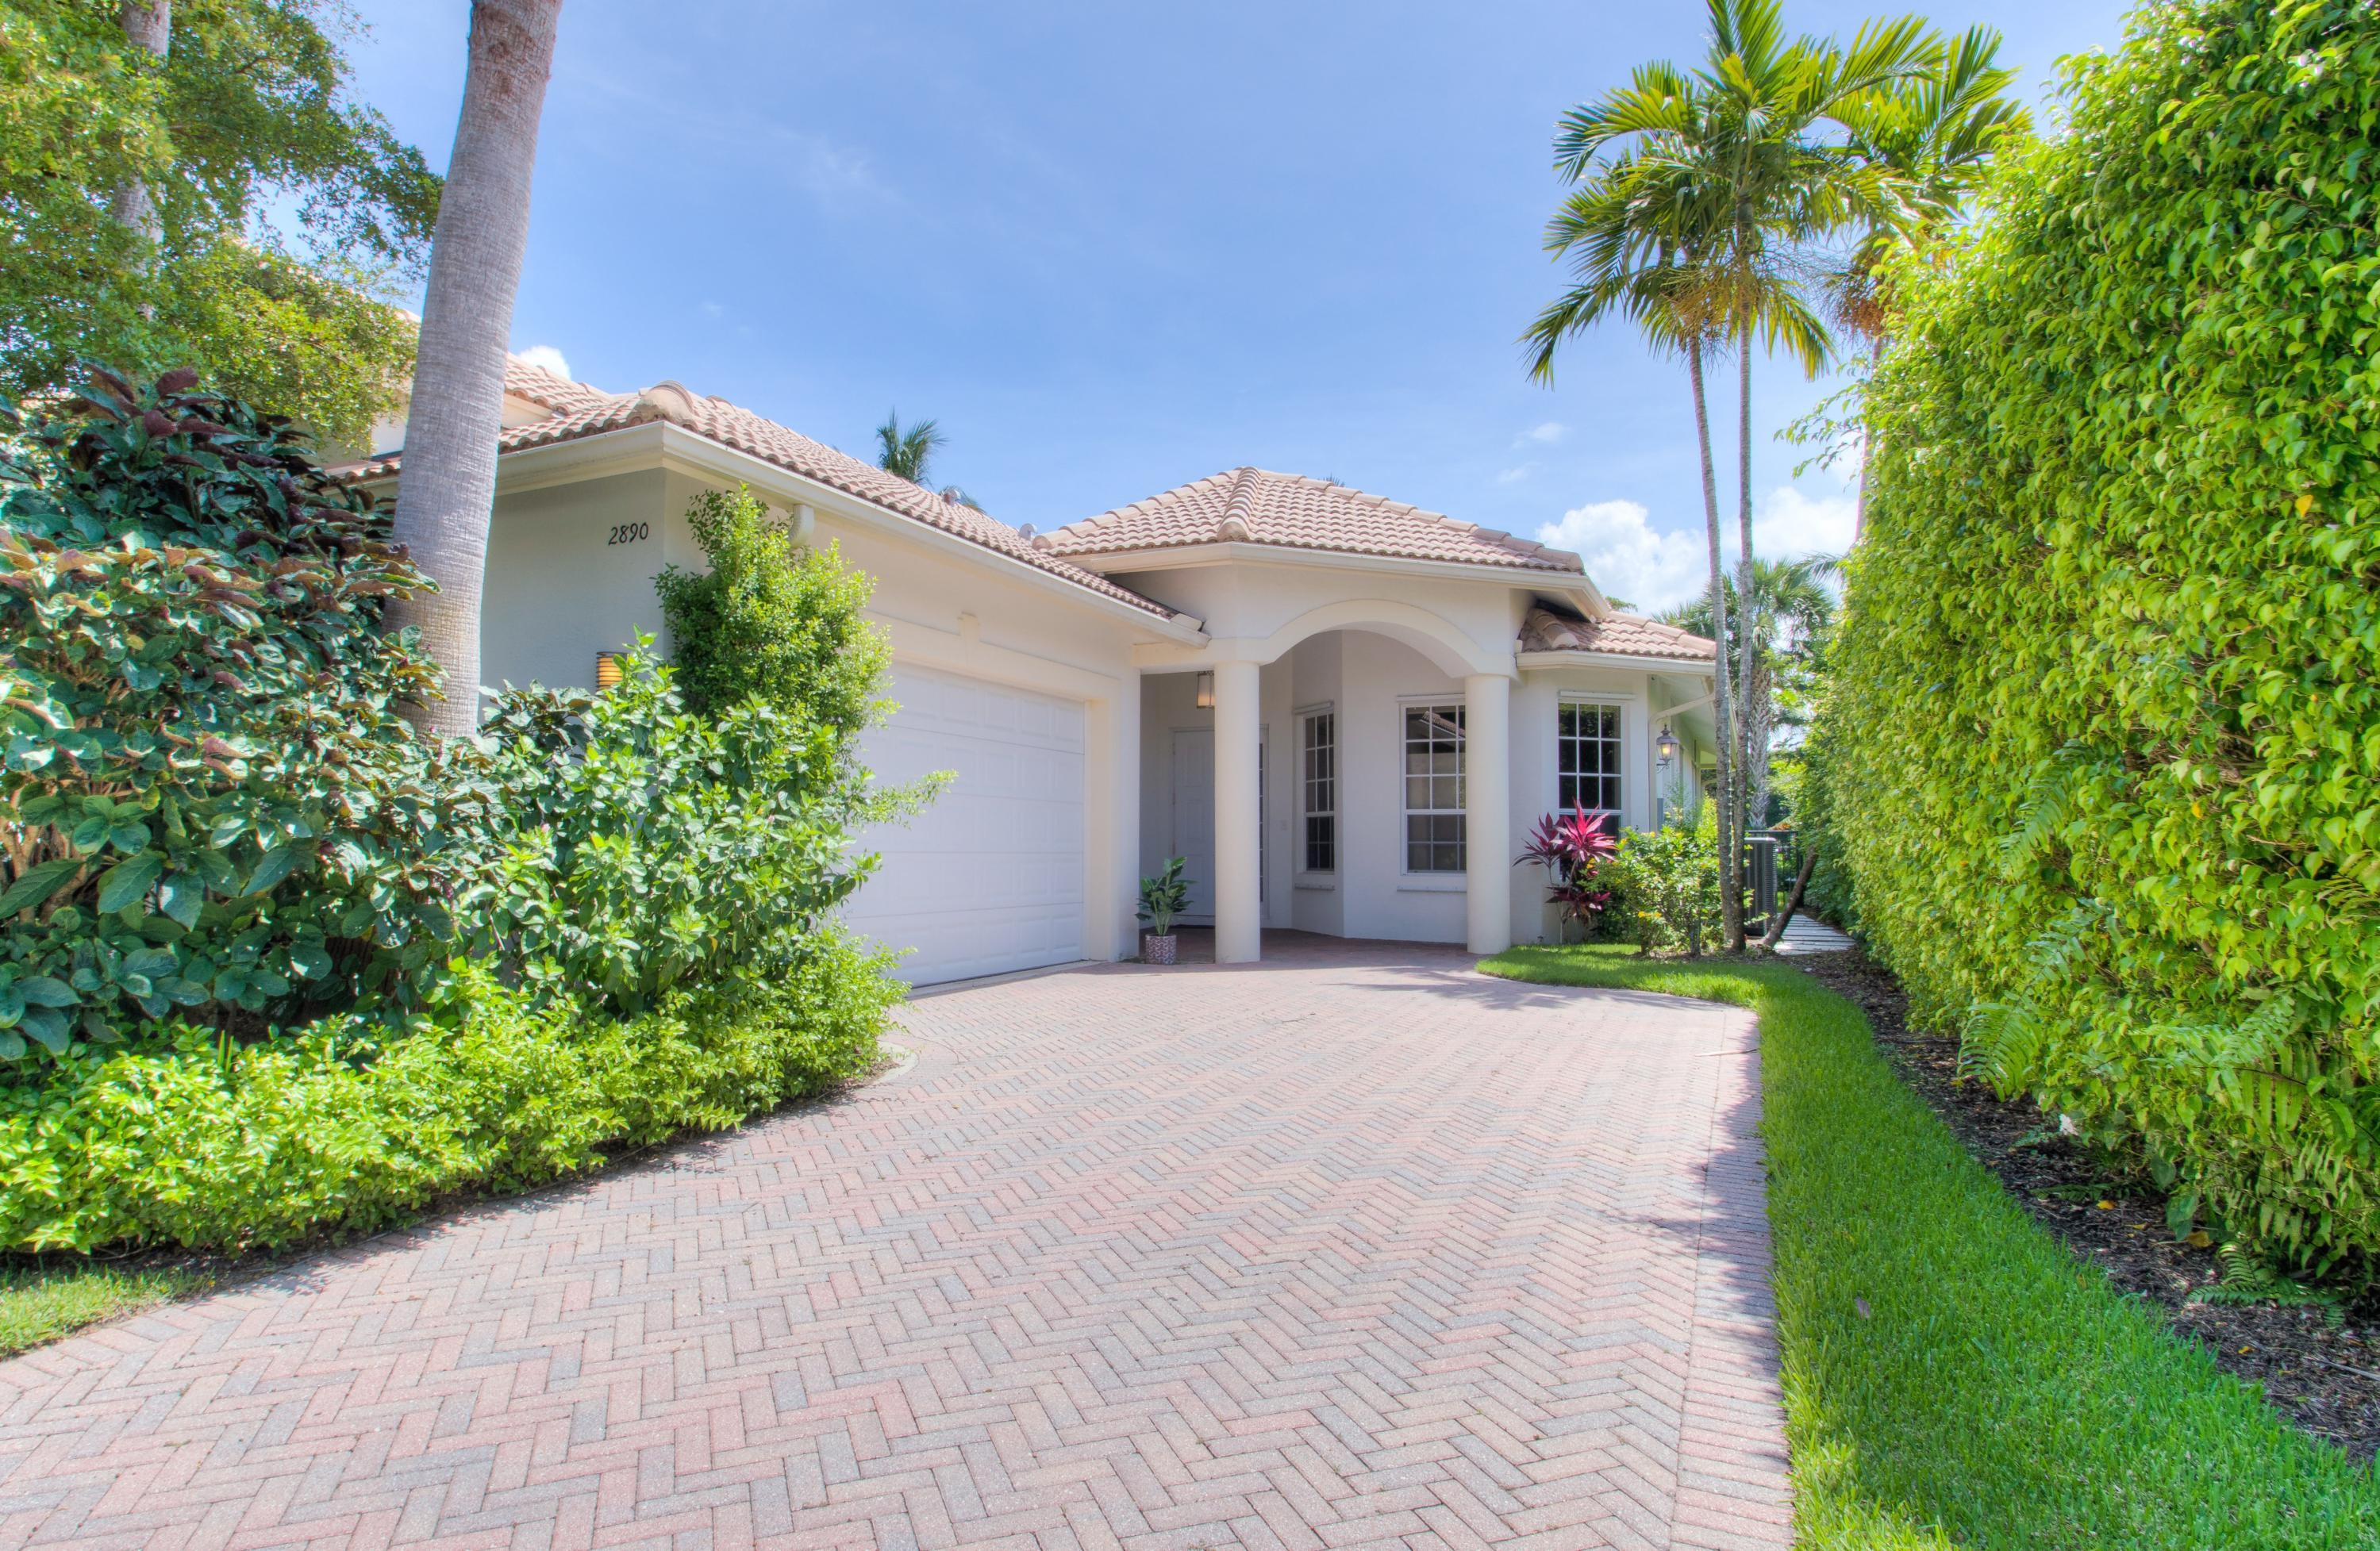 2890 Twin Oaks Way - Wellington, Florida